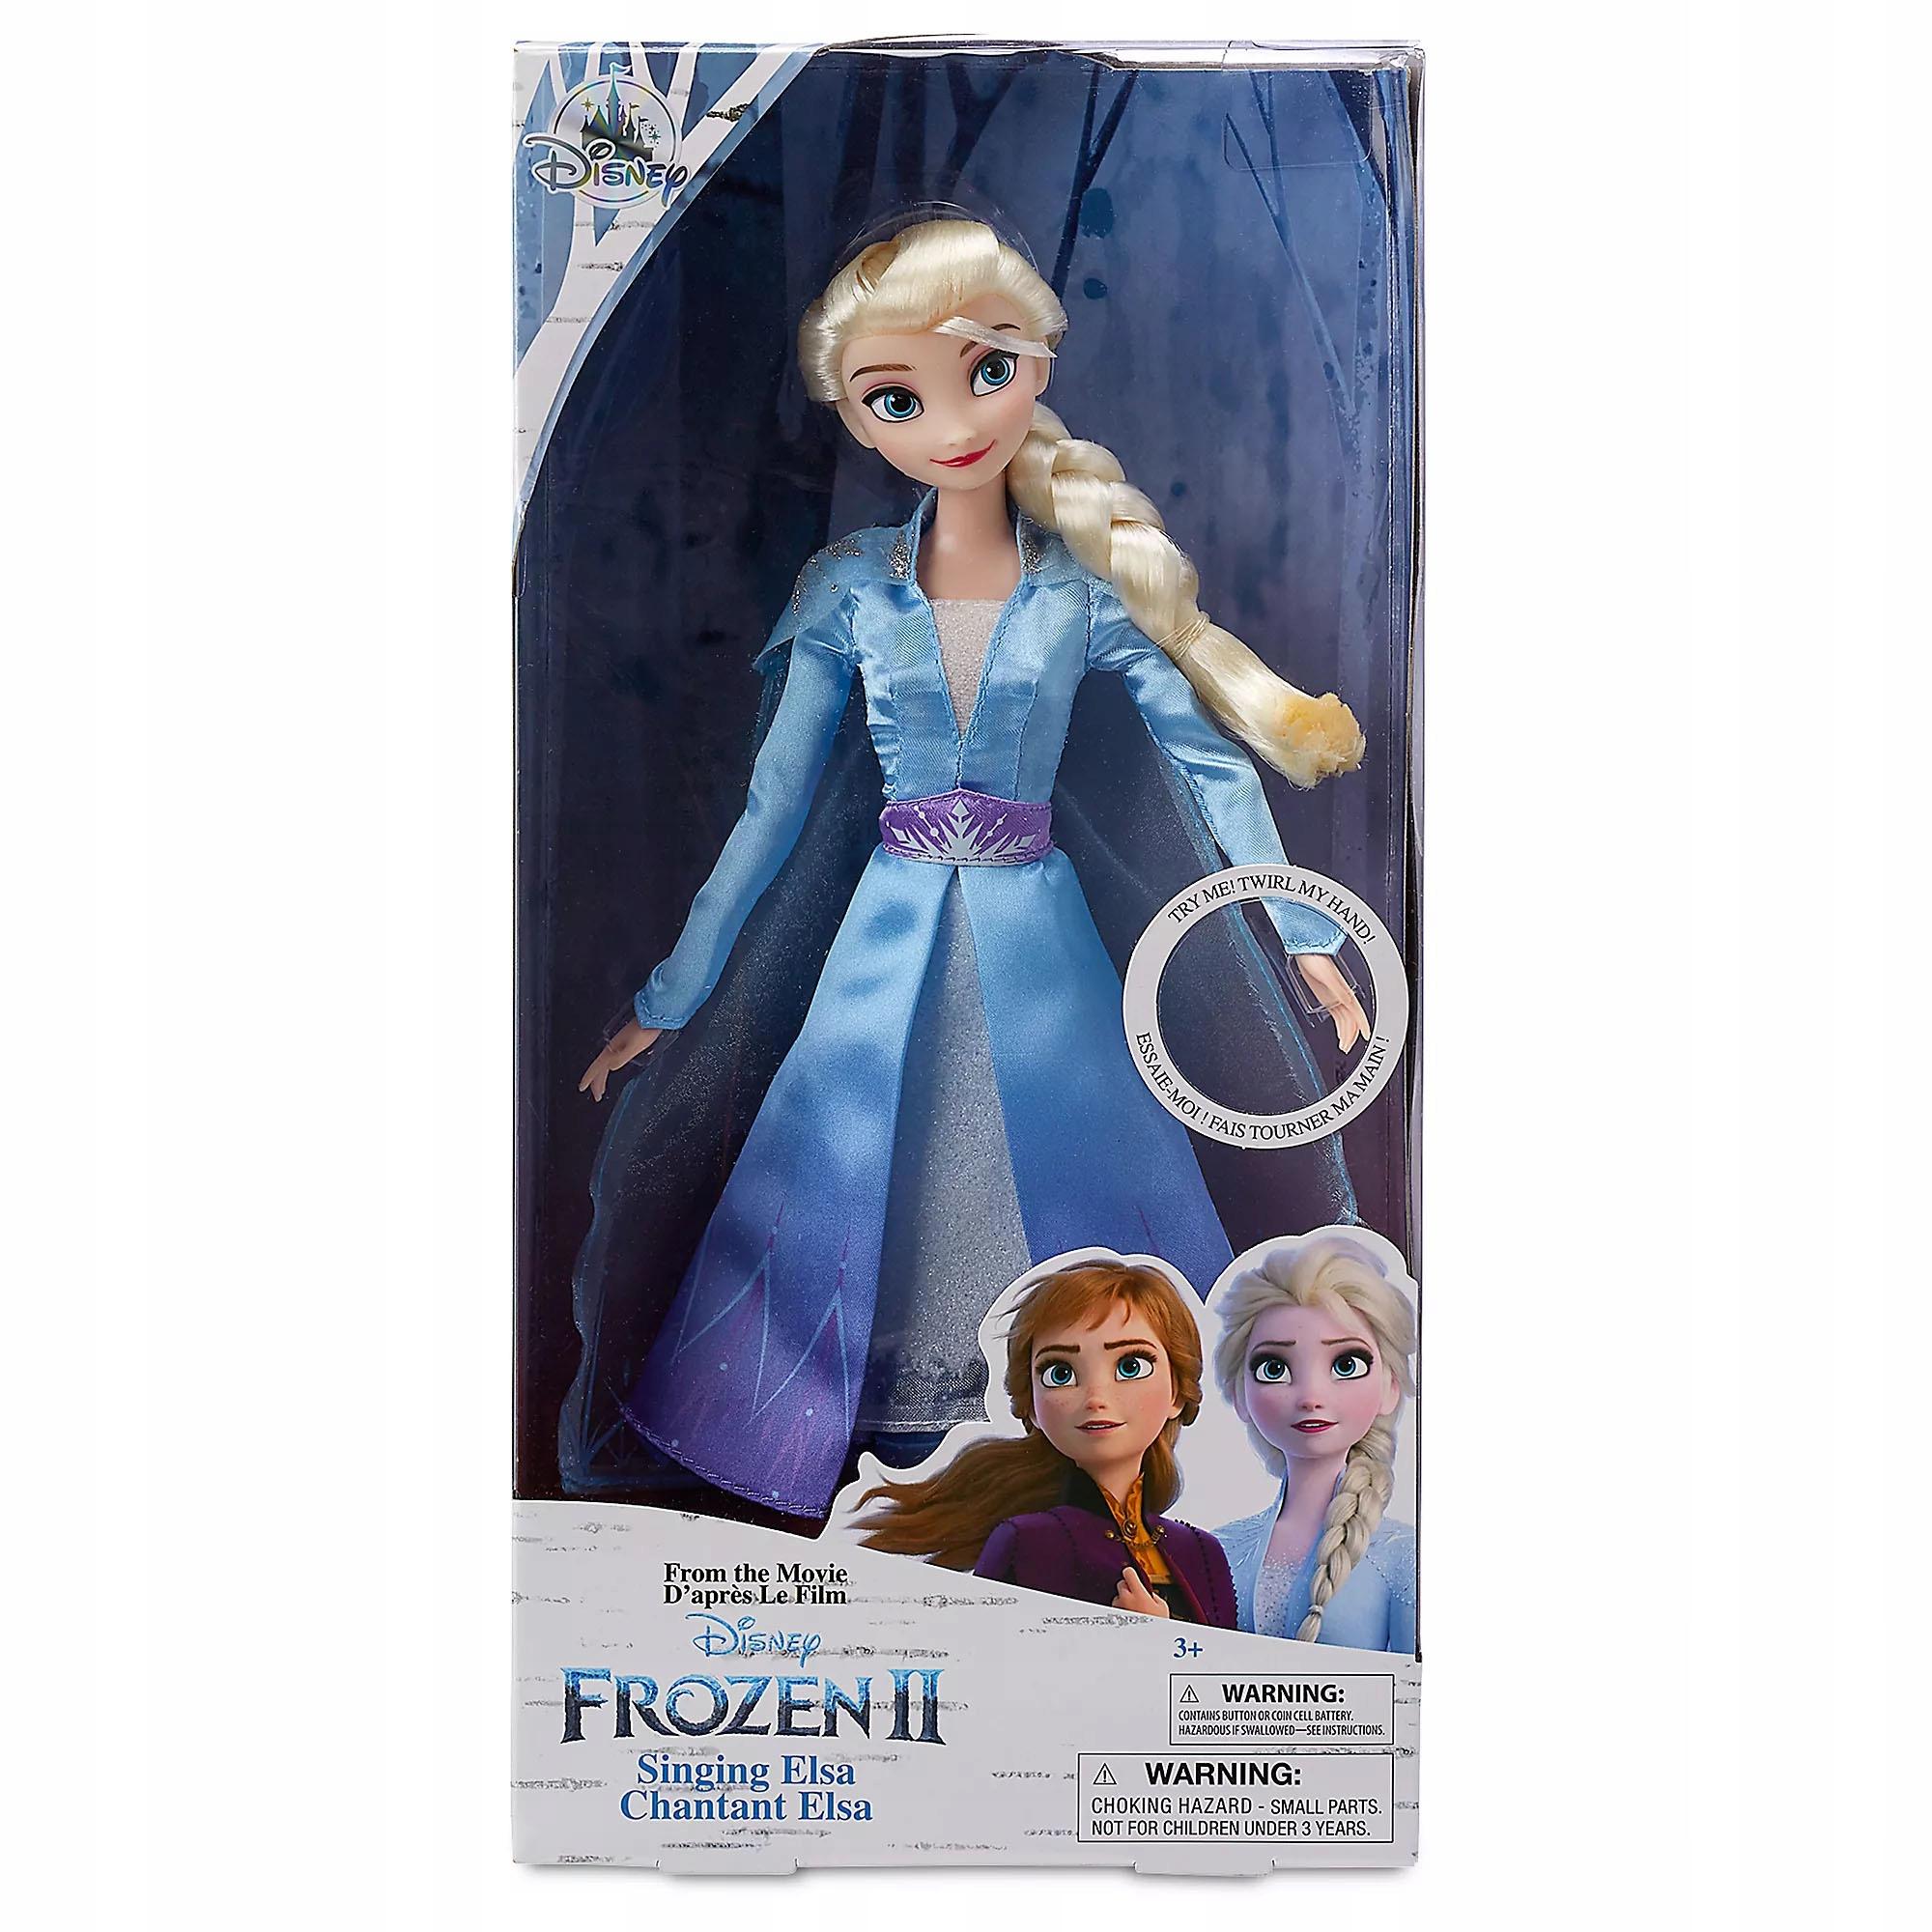 ŚPIEWAJĄCA LALKA ELSA KRAINA LODU FROZEN 2 DISNEY Marka Disney